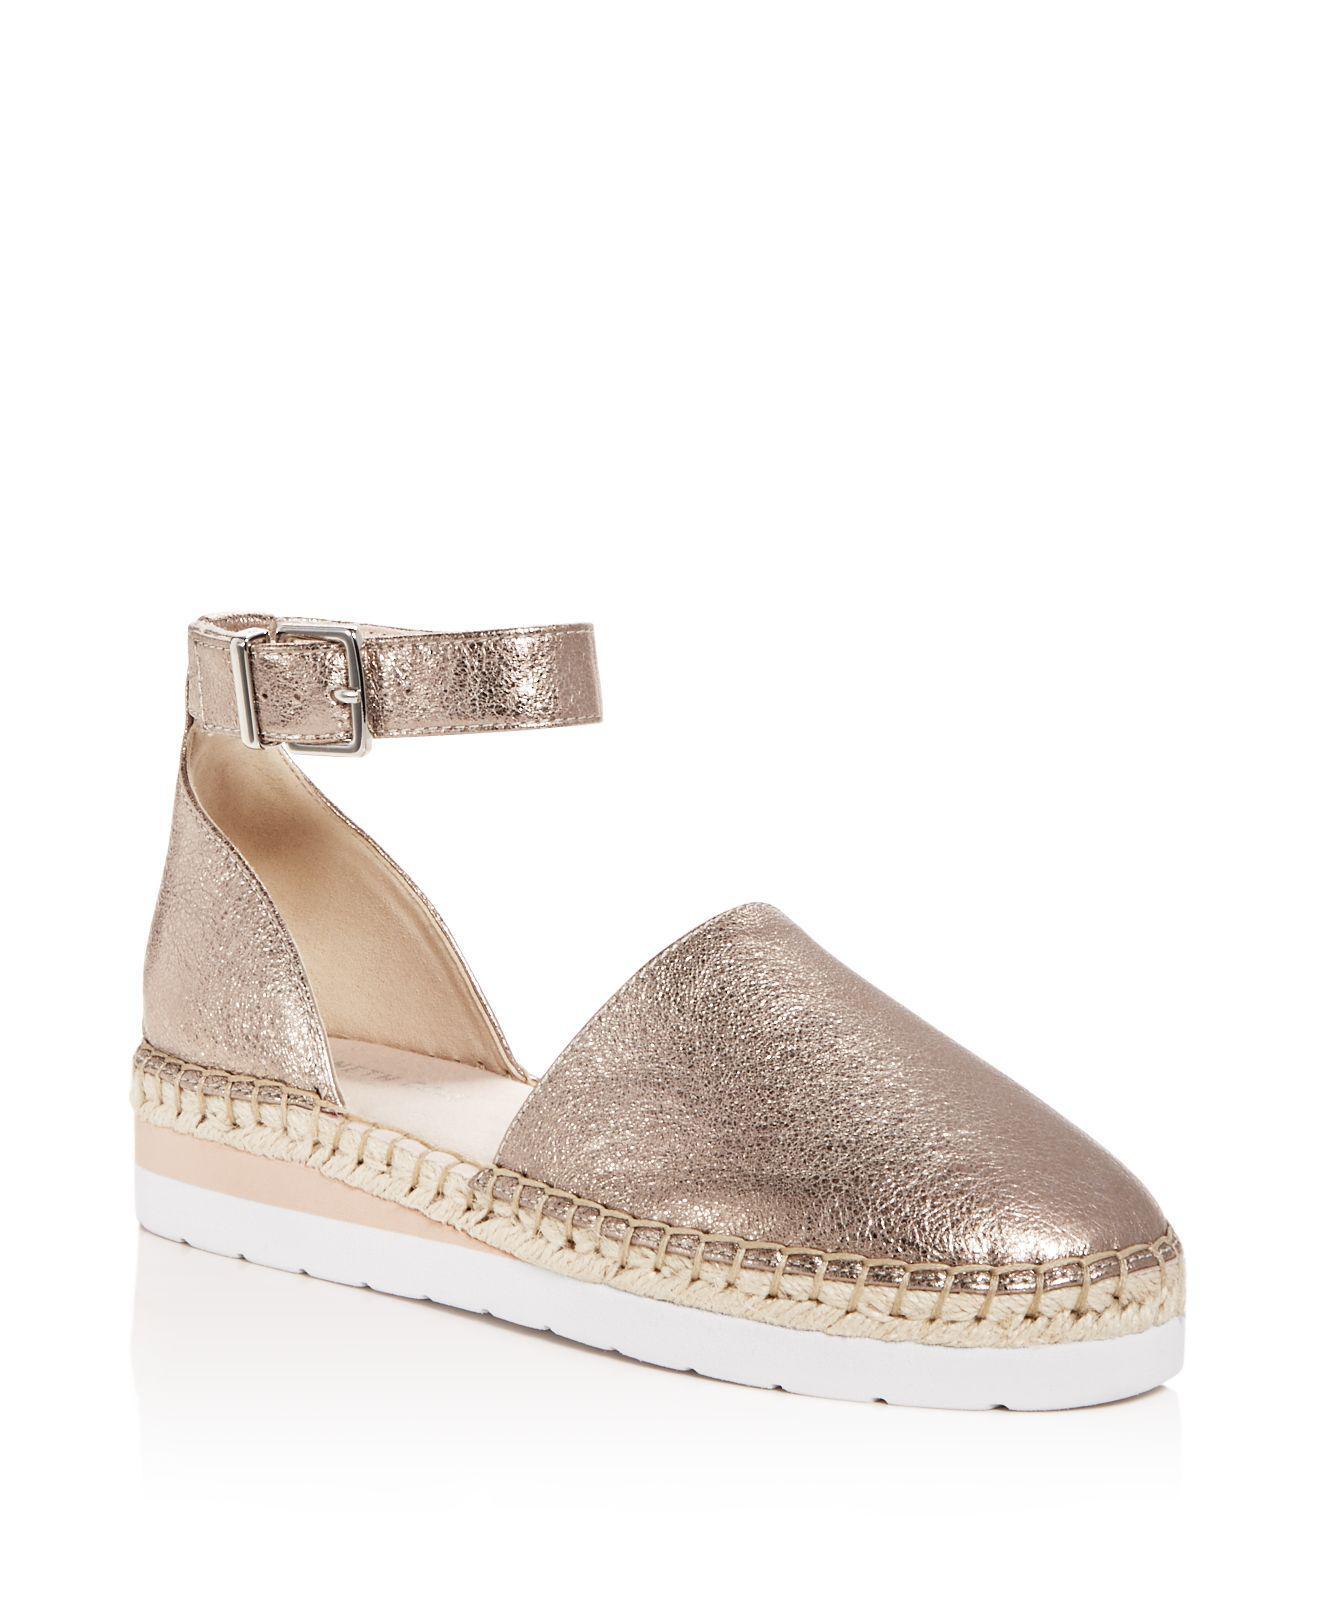 Kenneth Cole Women's Babbot Leather d'Orsay Espadrille Platform Sandals Lo72QtEoH